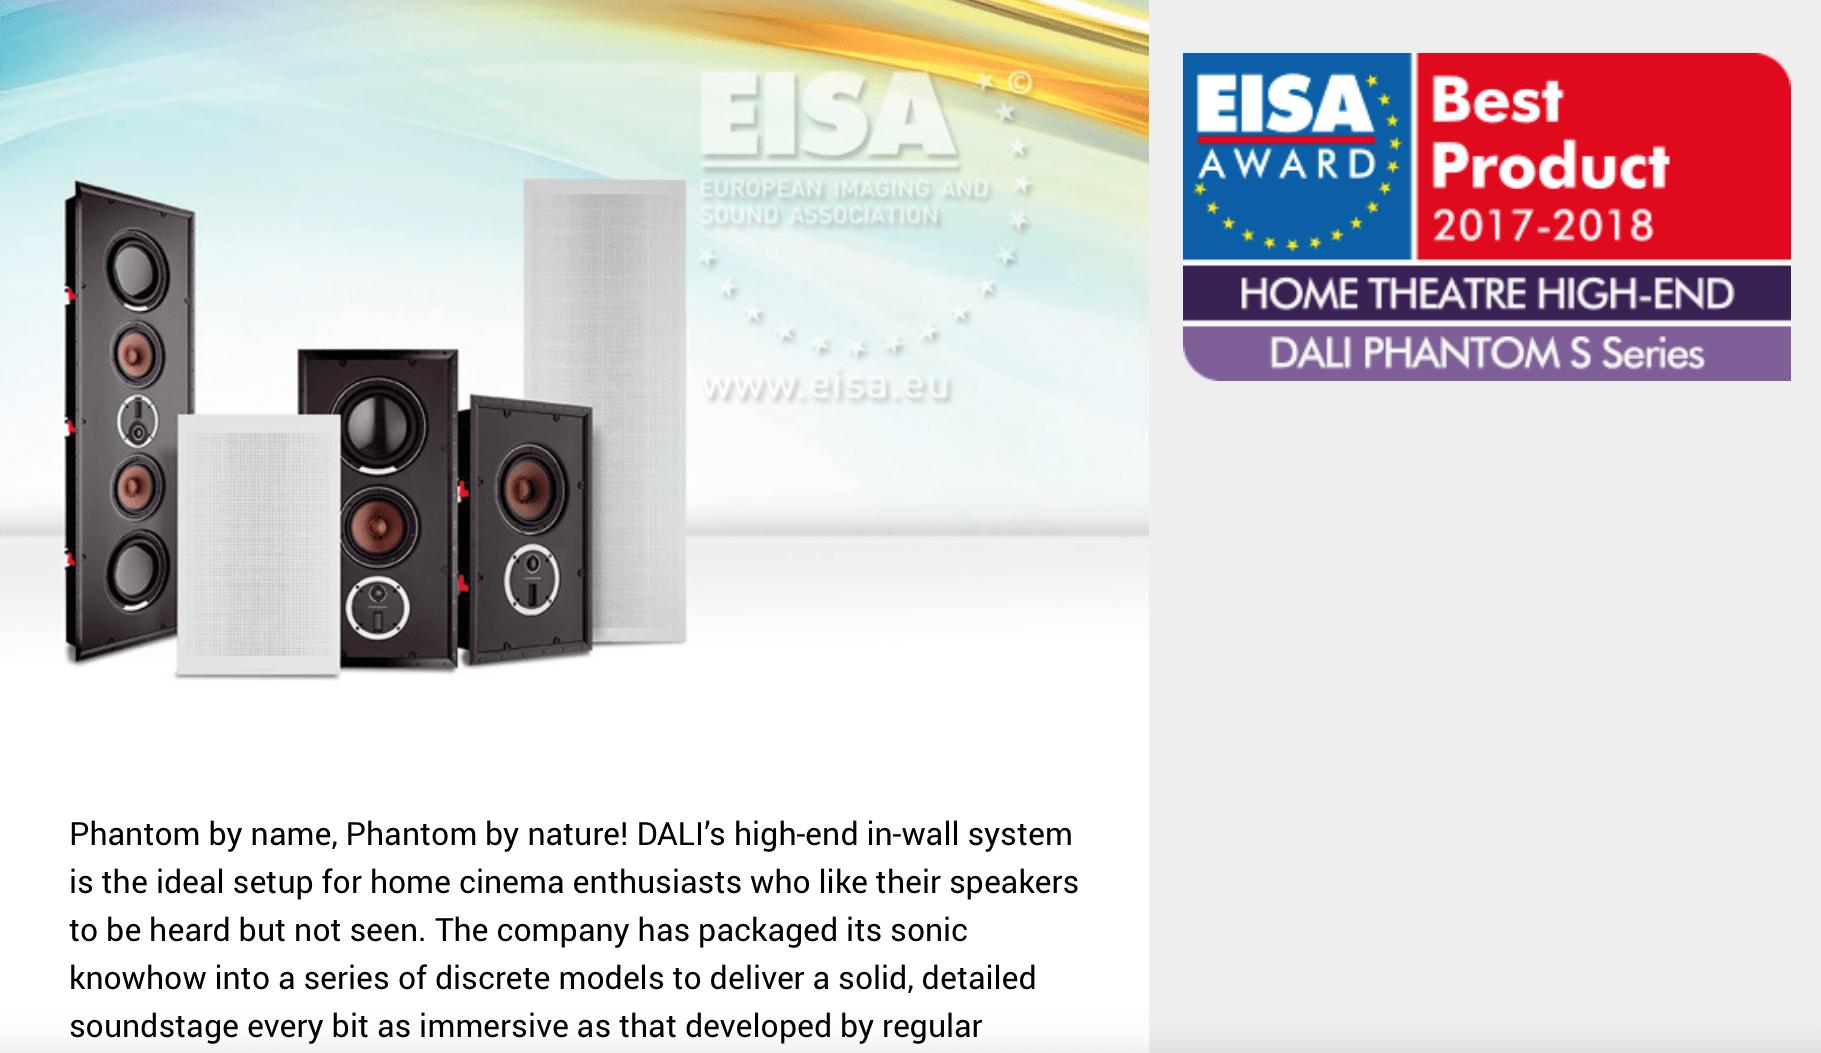 dali-phantom-s-series-wins-eisa-award